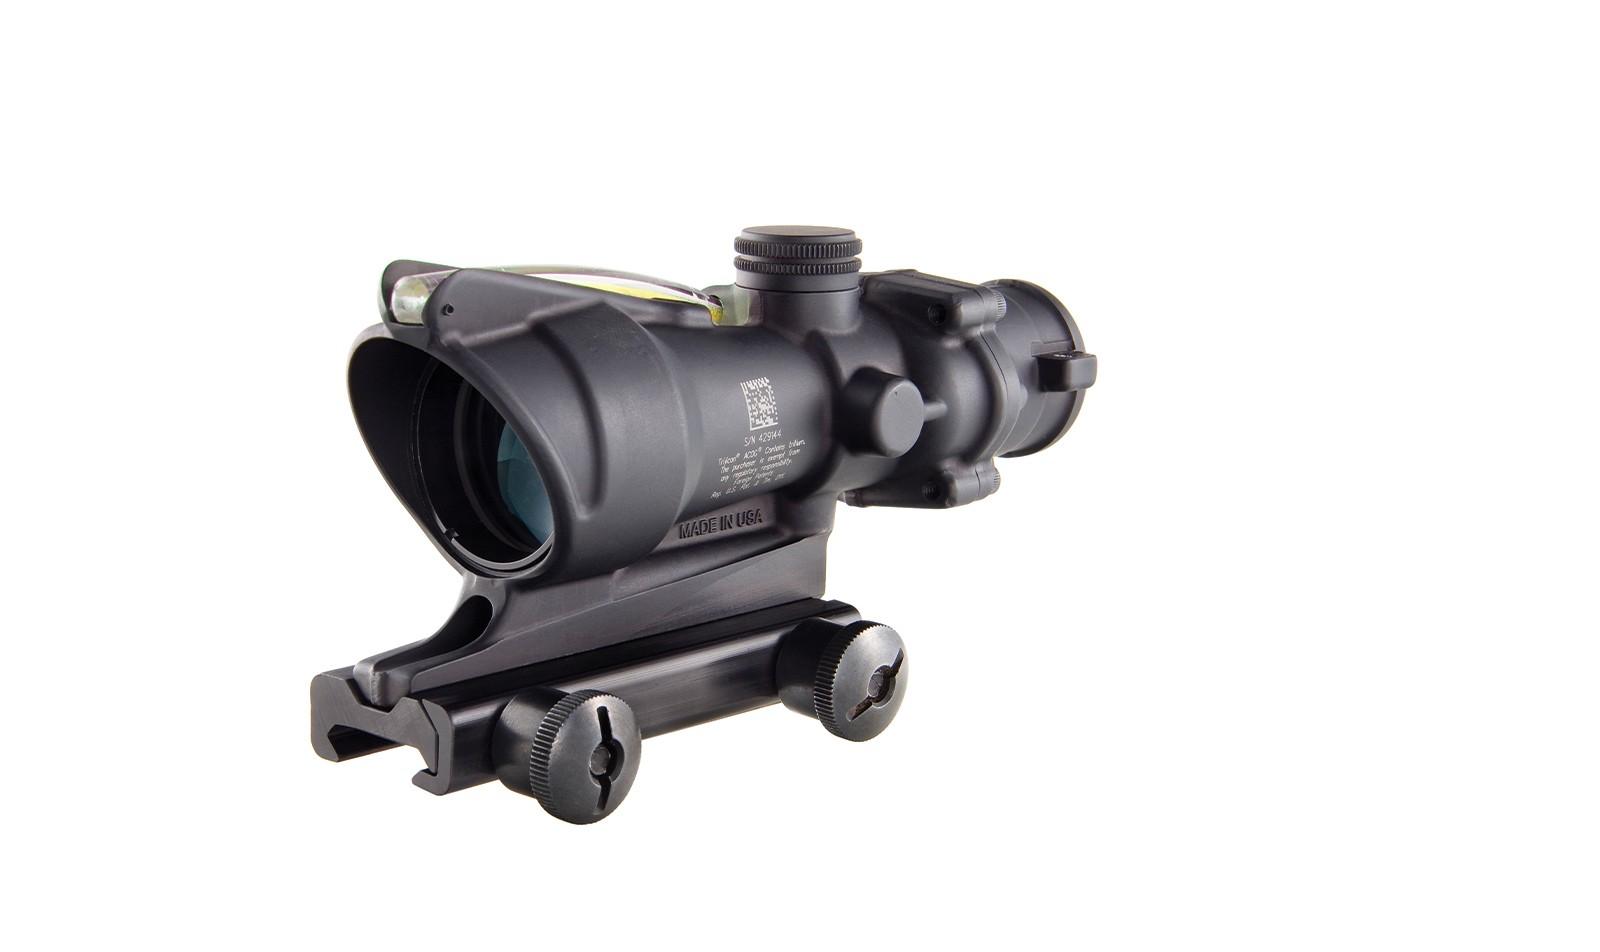 Trijicon ACOG® 4x32 BAC Riflescope - 300 BLK BDC